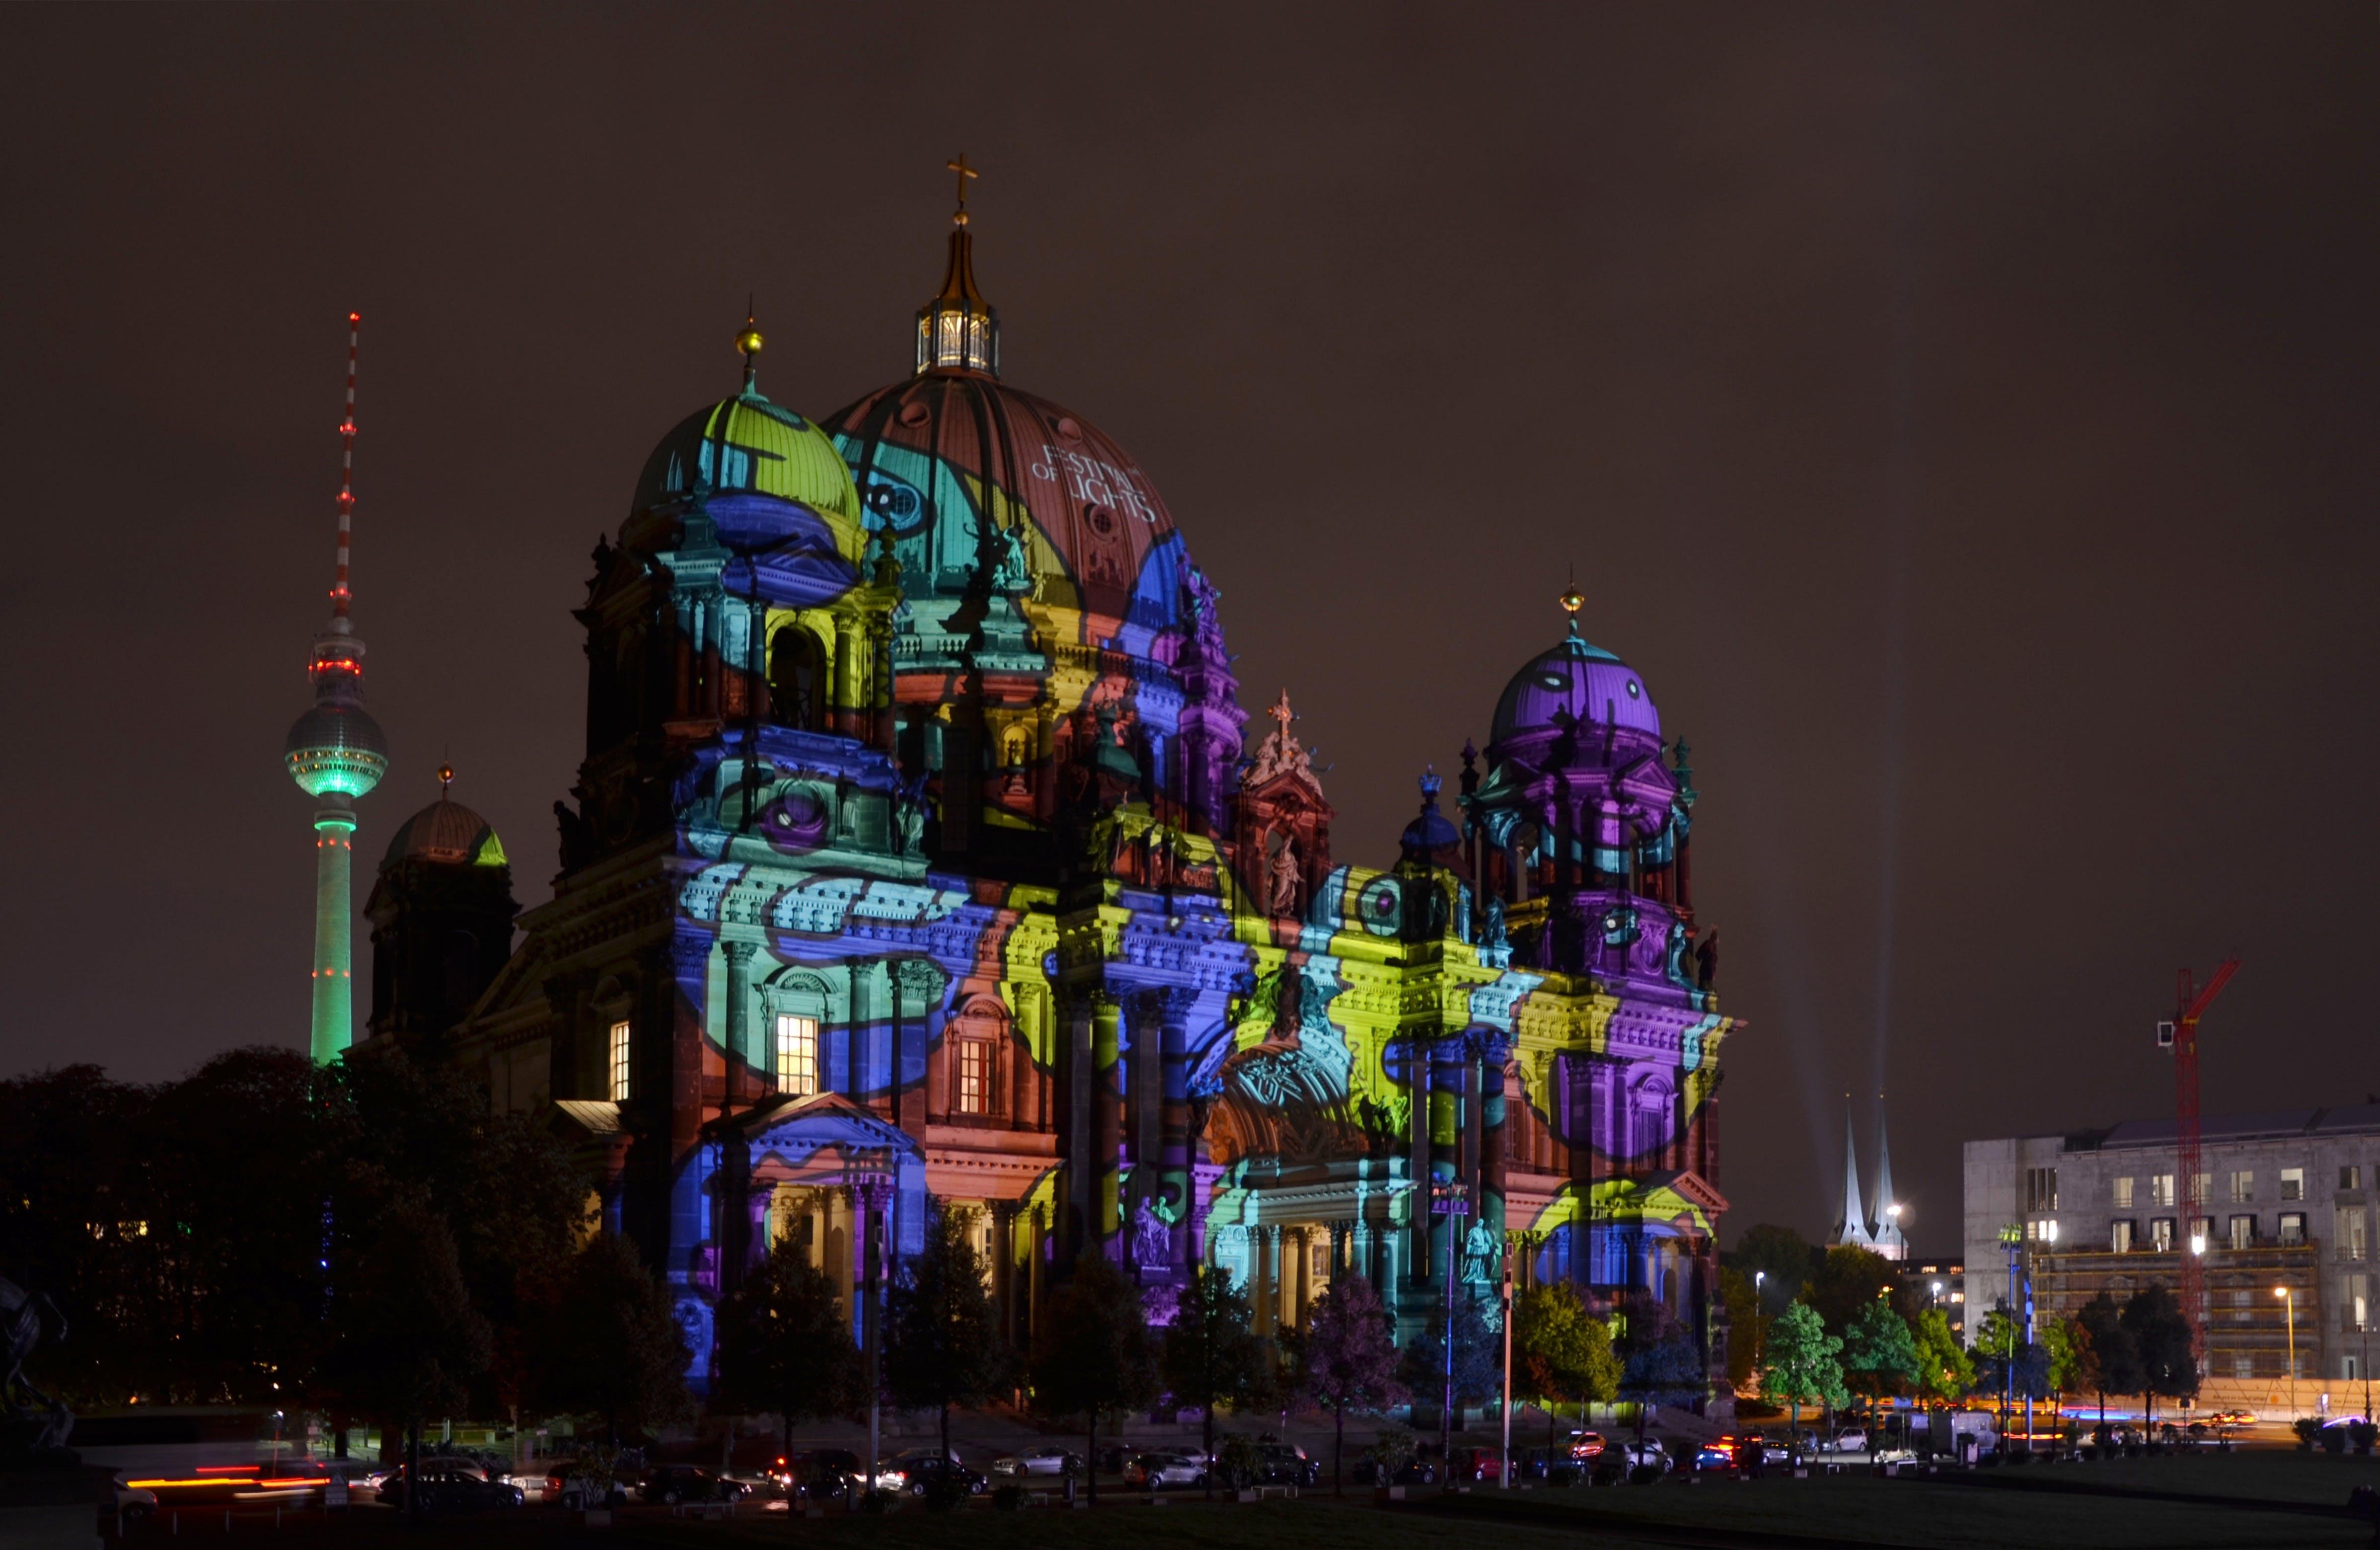 Free stock photo of light, city, art, landmark